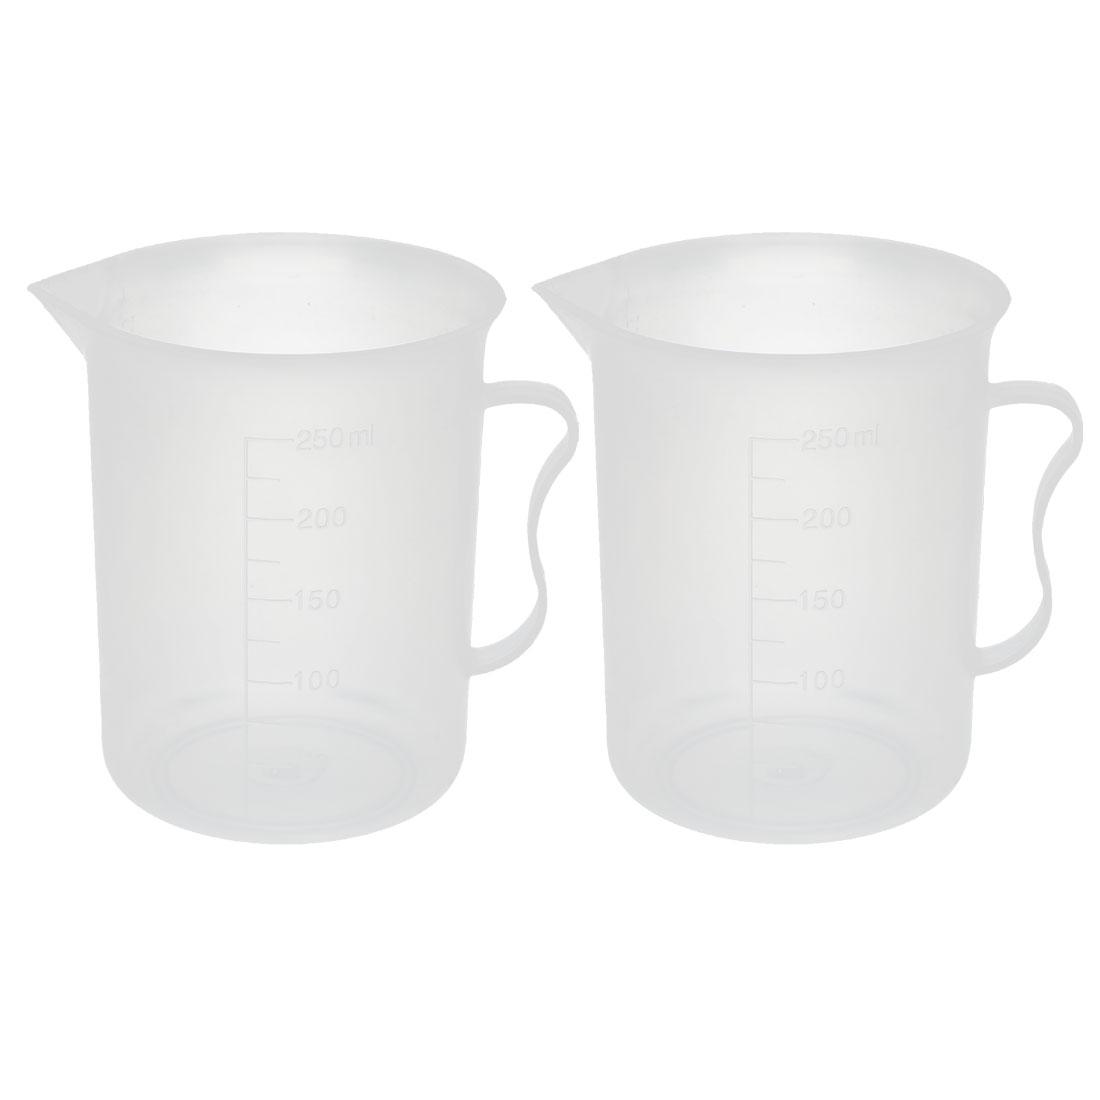 2Pcs Round 250ML Plastic Measurement Cup w Cup Handle Laboratory Equipment